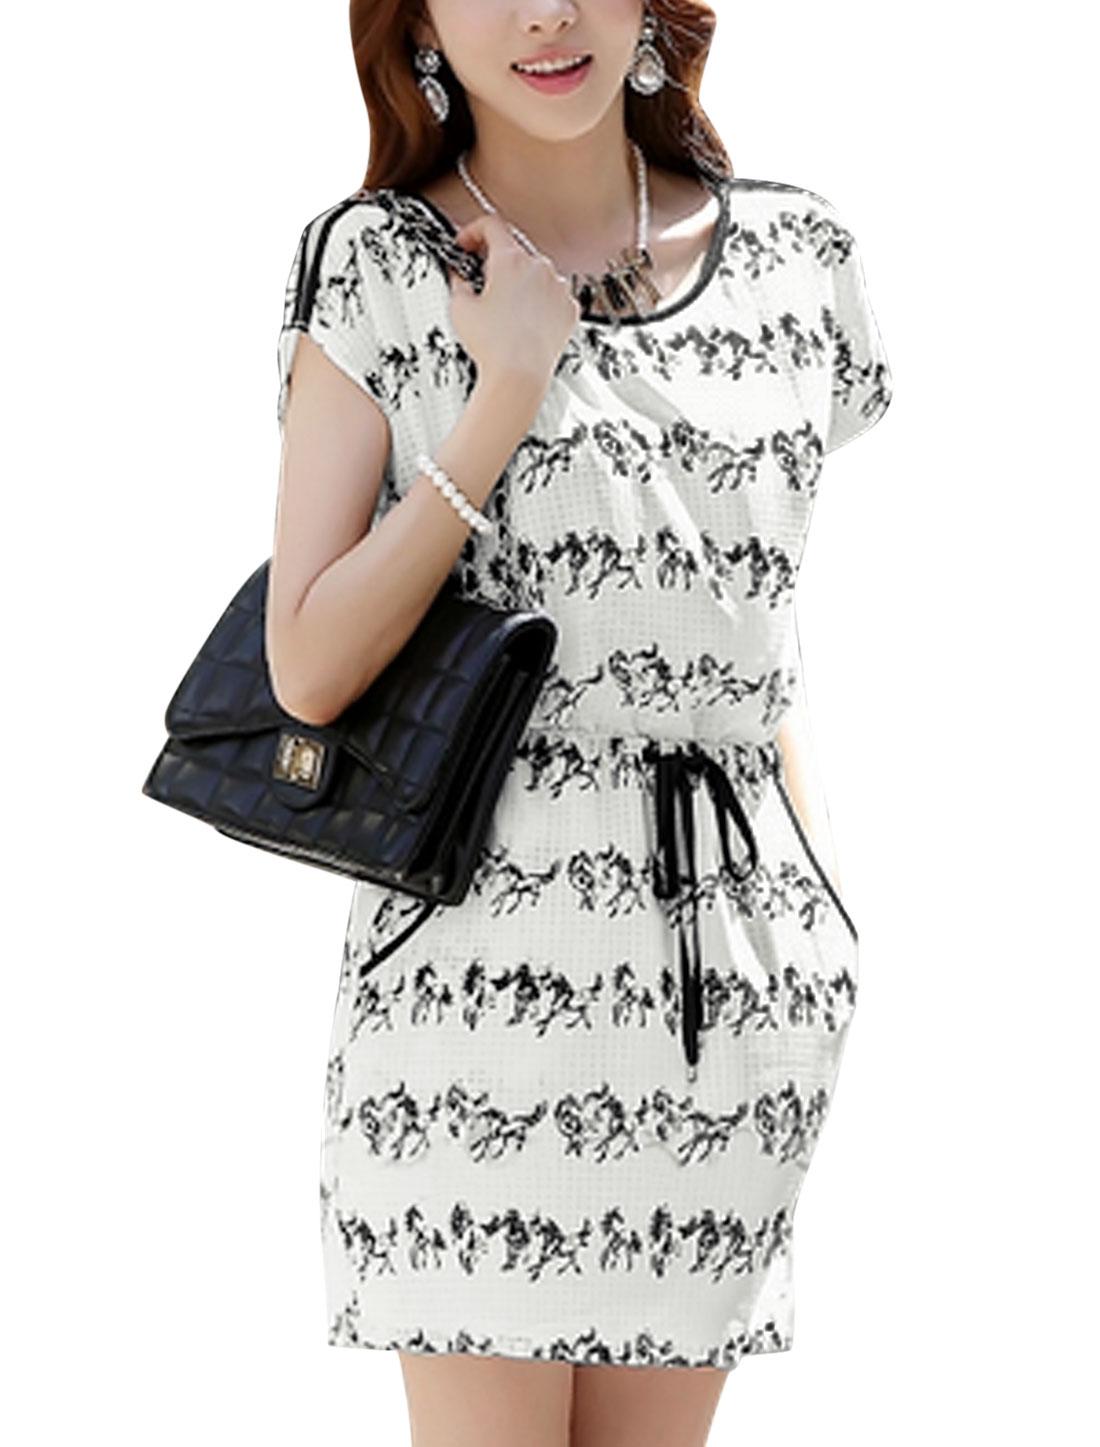 Lady Short Sleeve Cut Out Shoulder Round Neck Dress White M